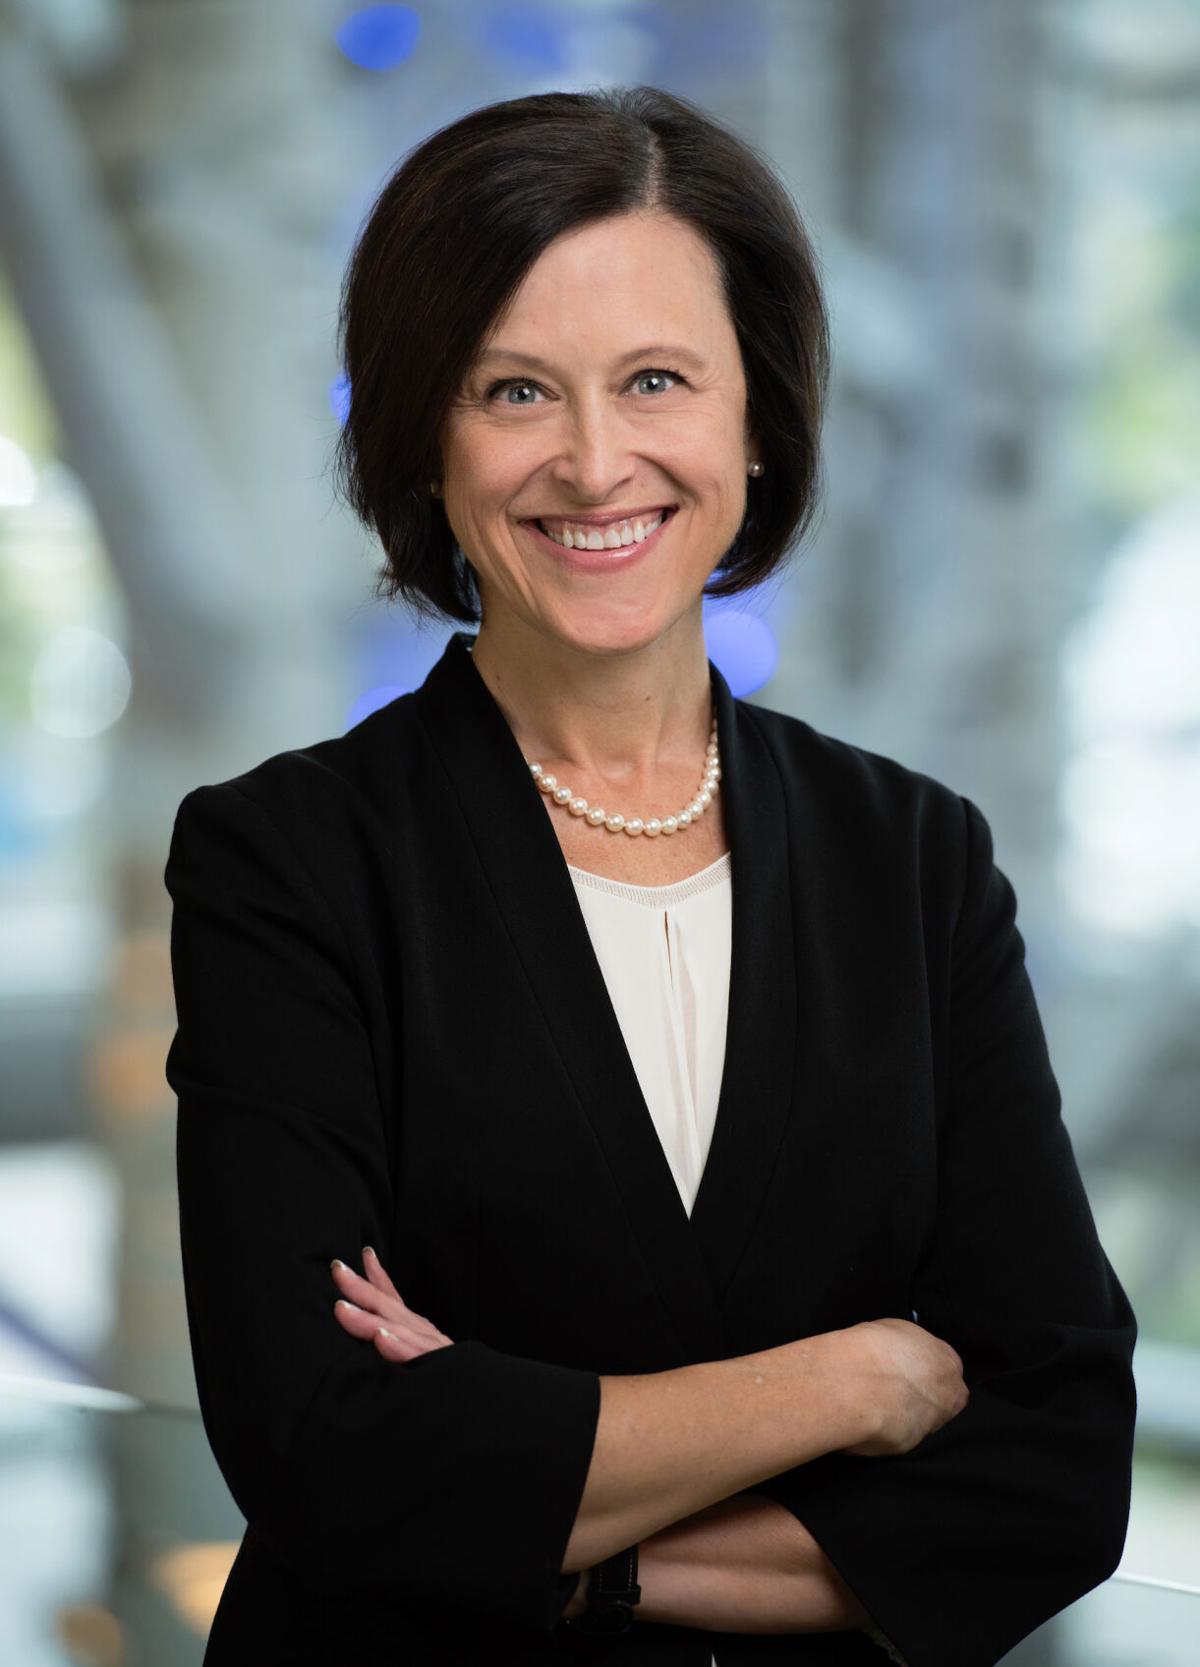 Maureen Dzialo